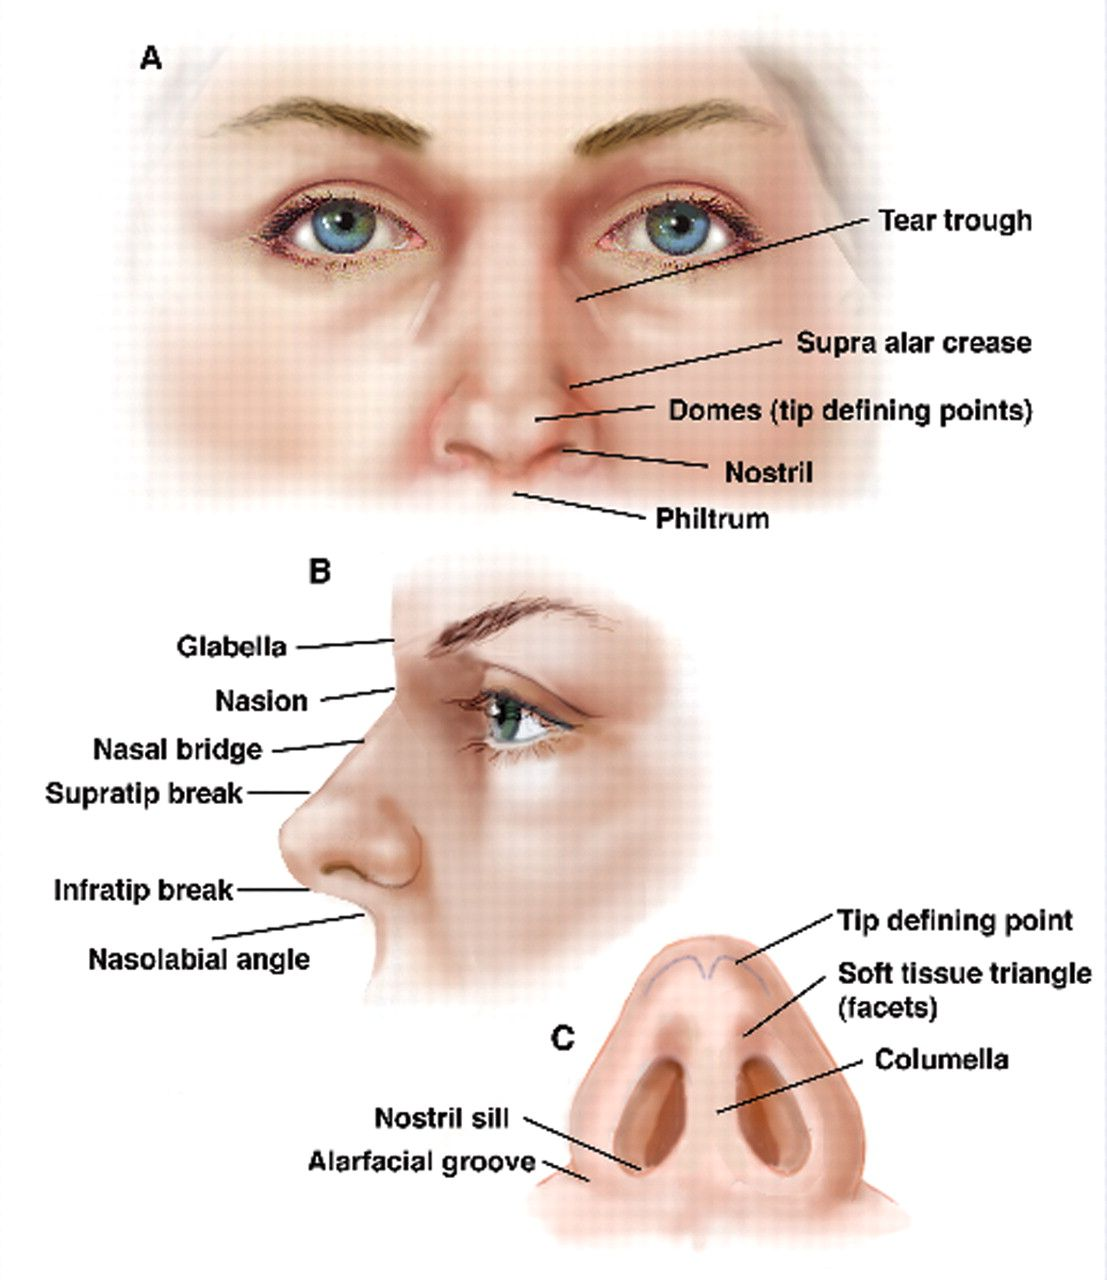 Human facial anatomy